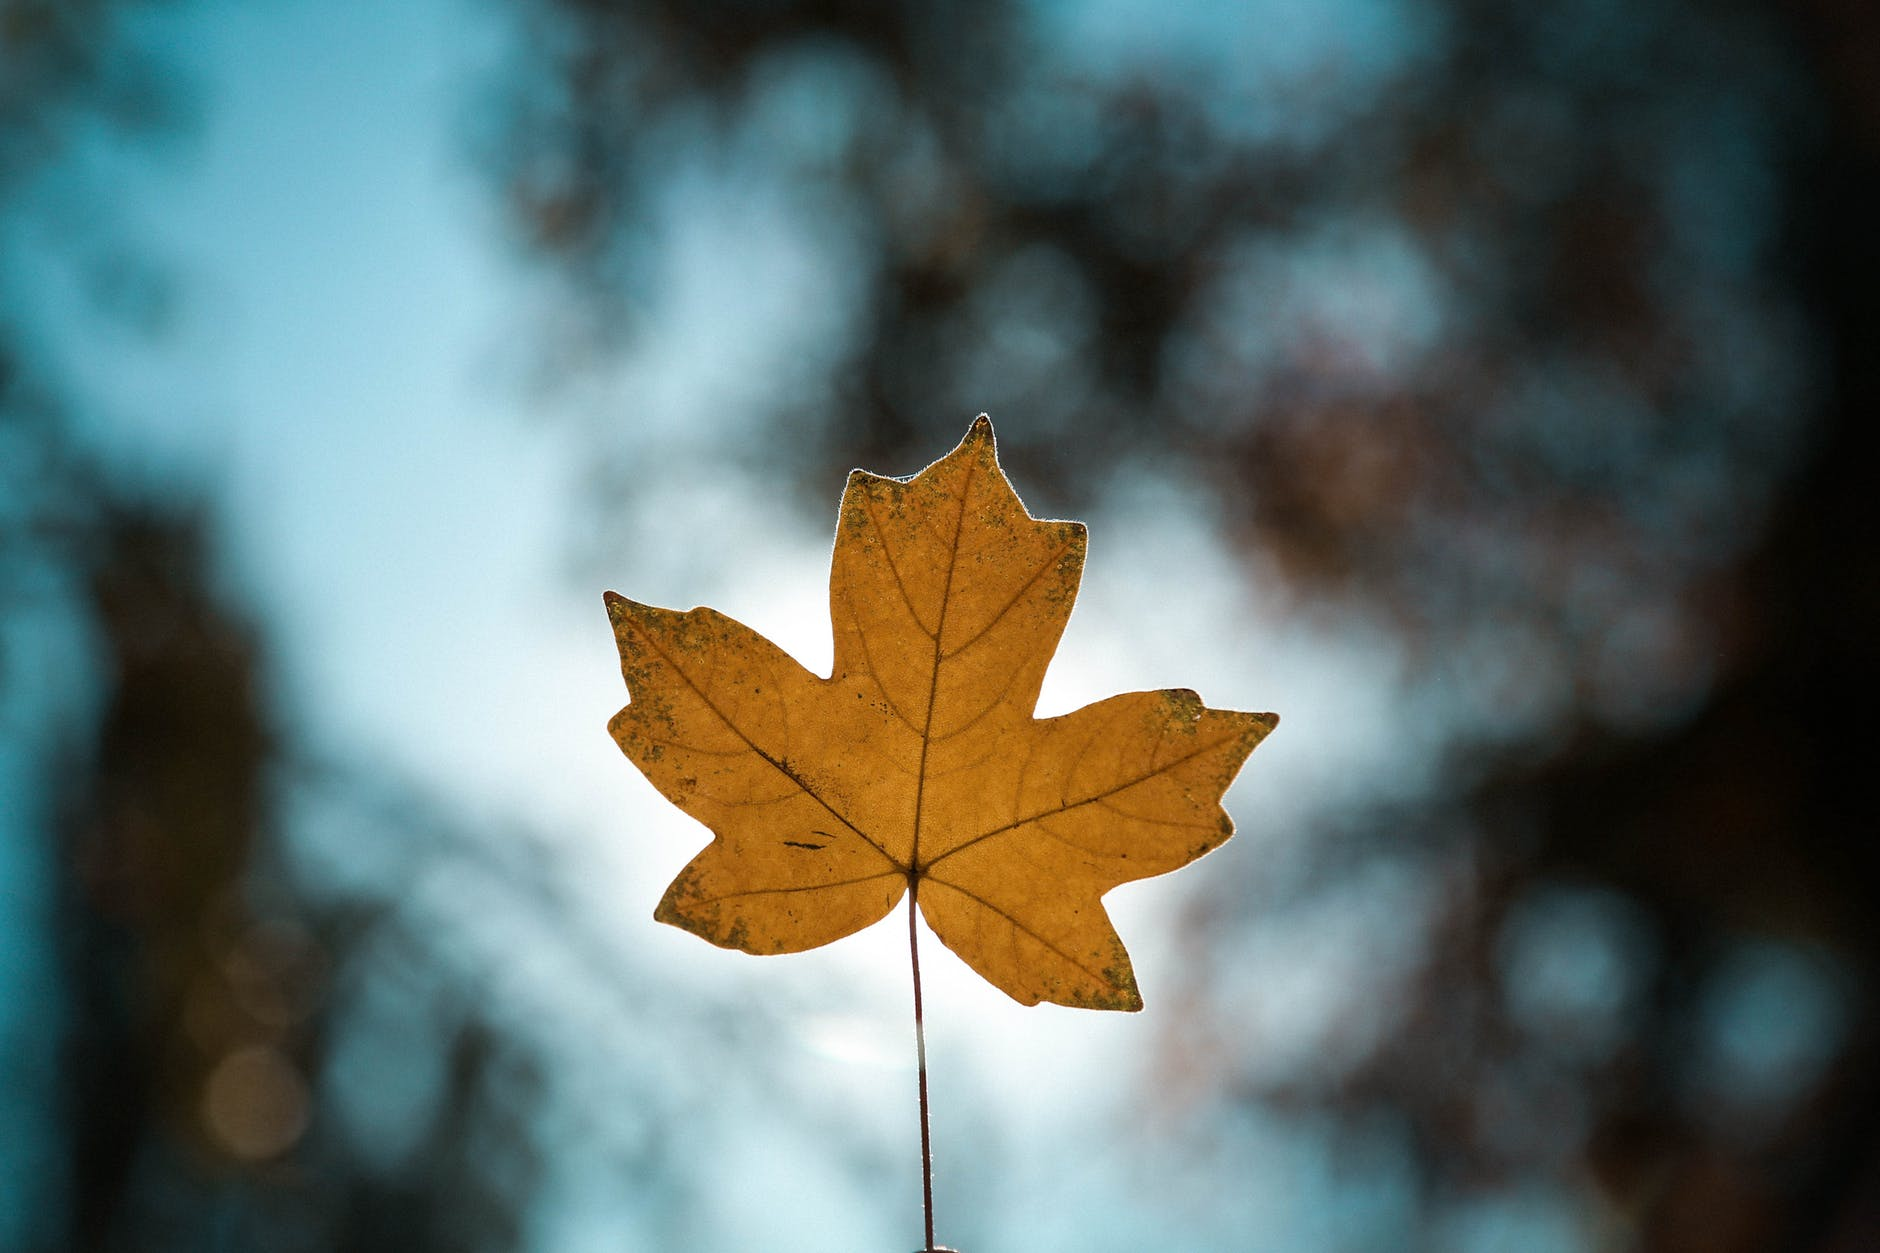 close up photo of maple leaf